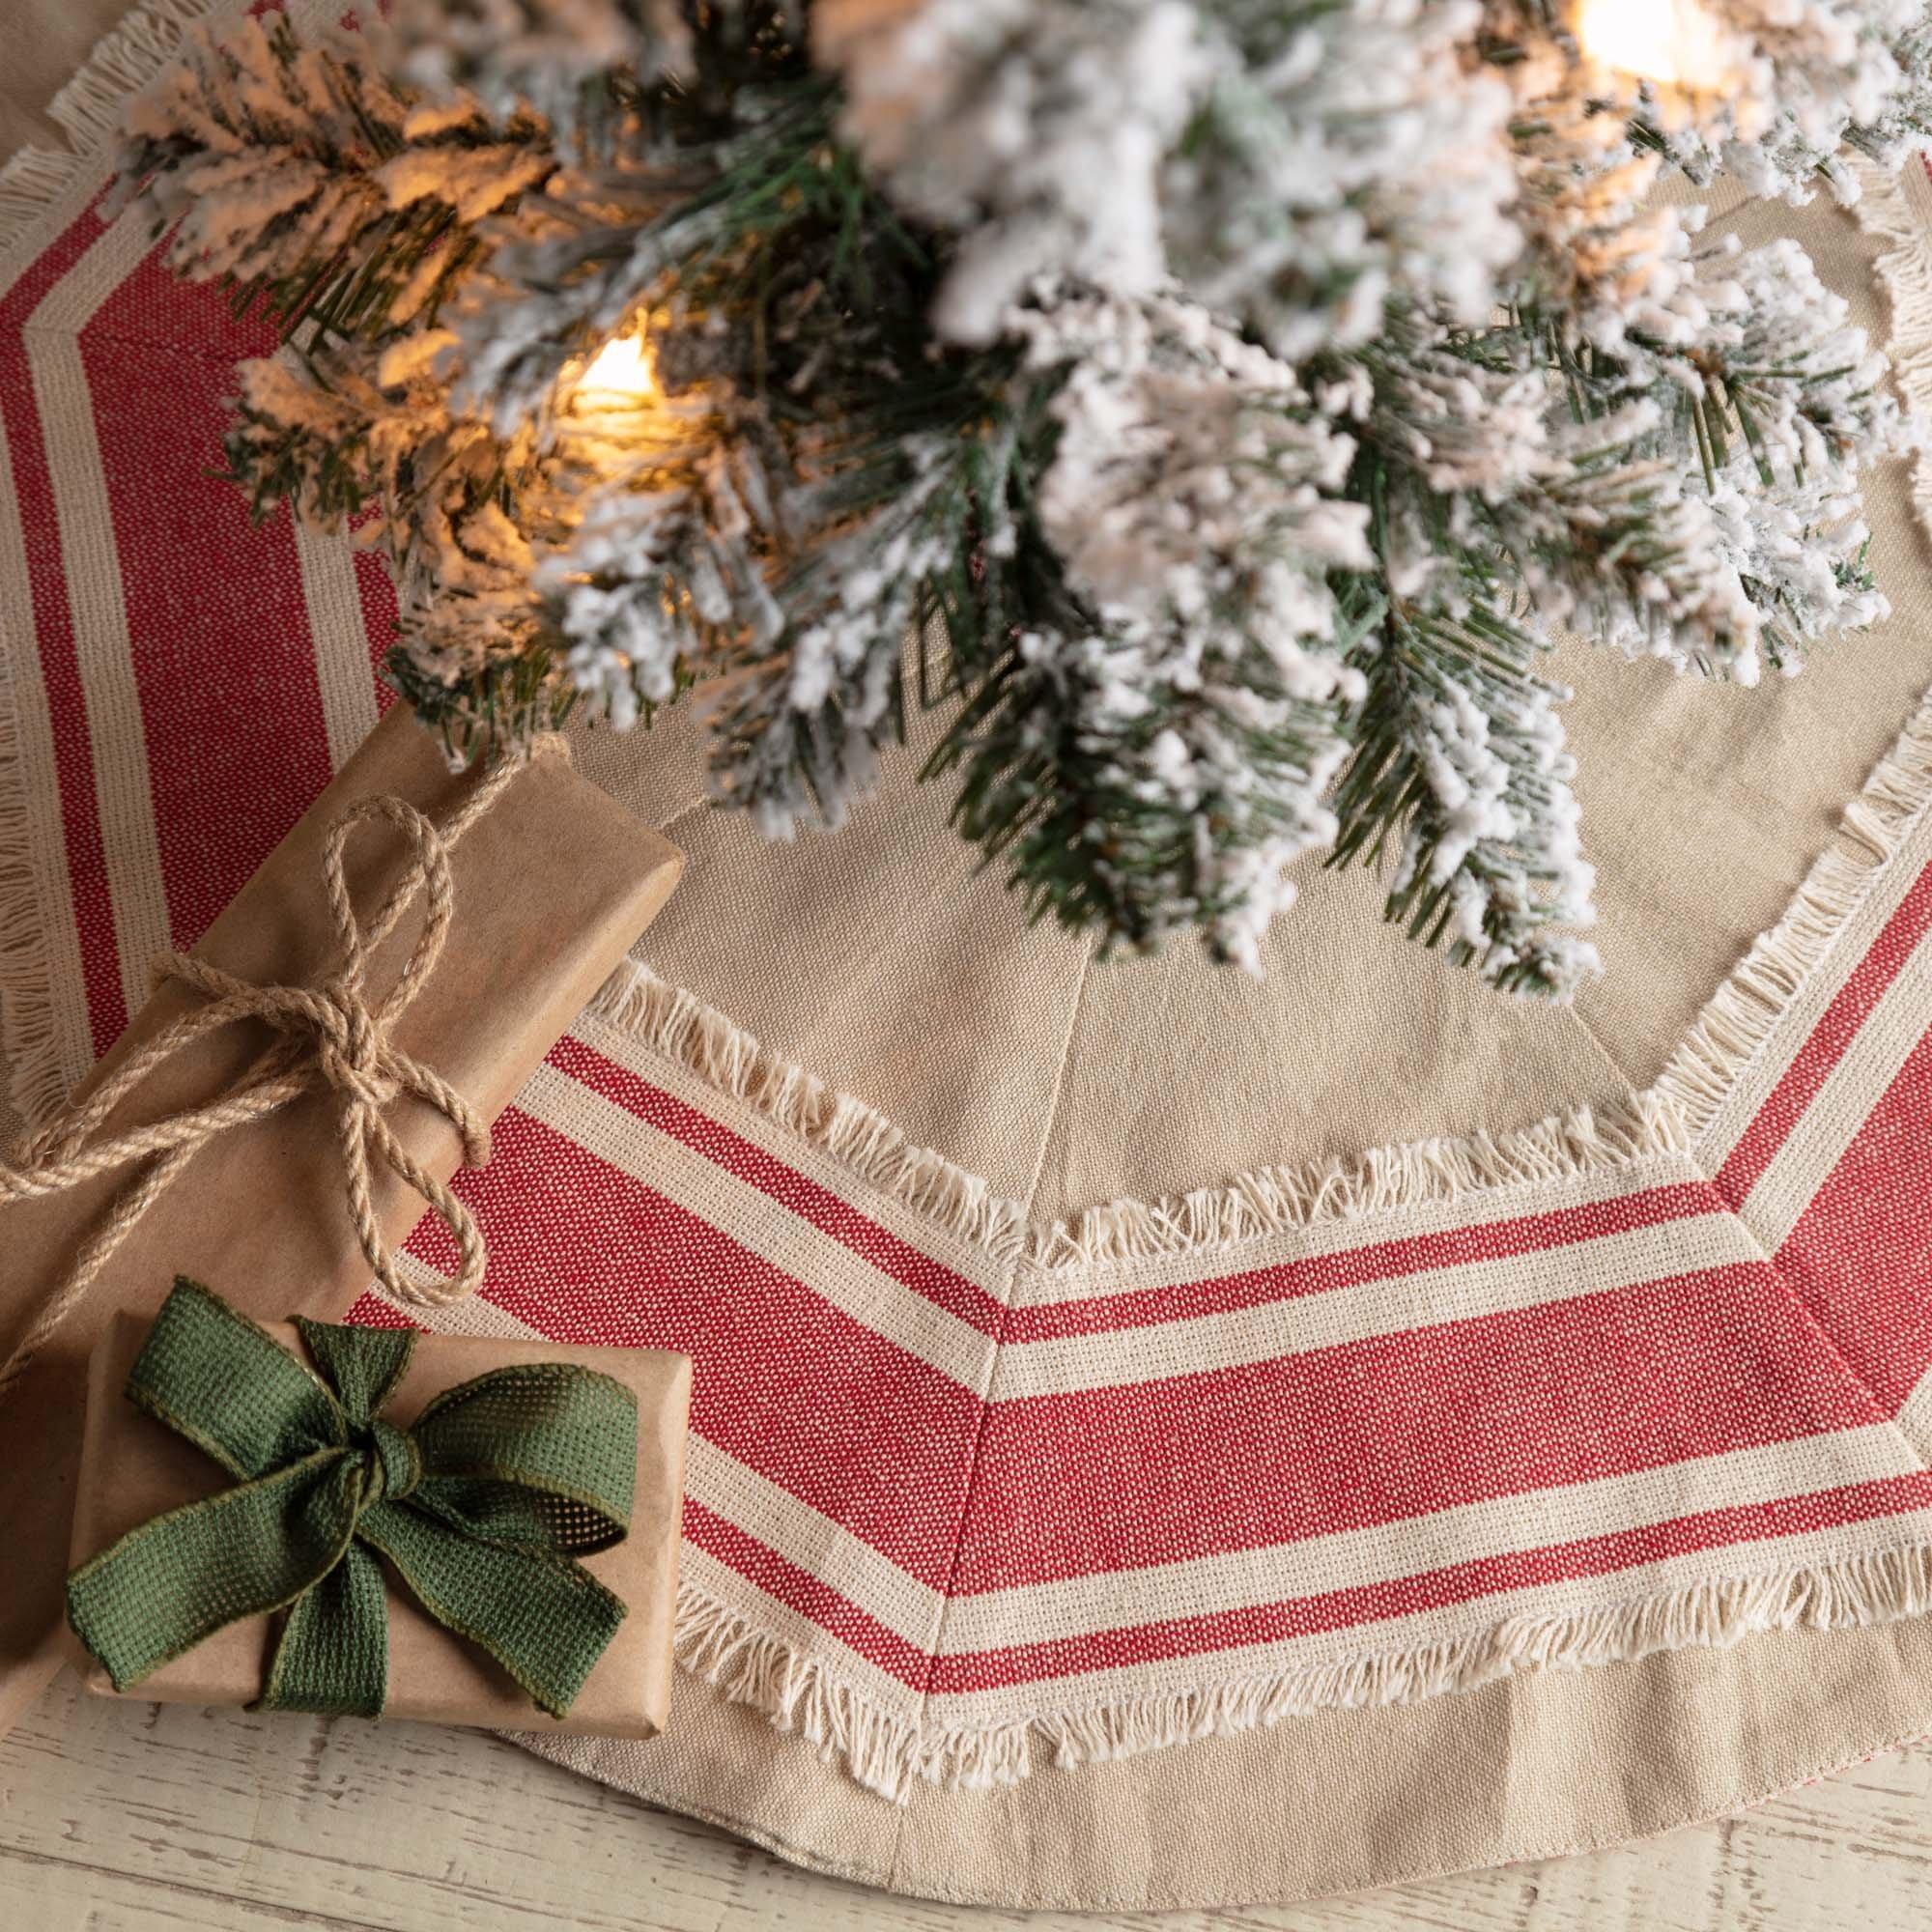 Piper Classics Farmhouse Red Grain Sack Stripe Mini Tree Skirt, 21'' Diameter, Country Farmhouse Christmas Holiday Seasonal Decor